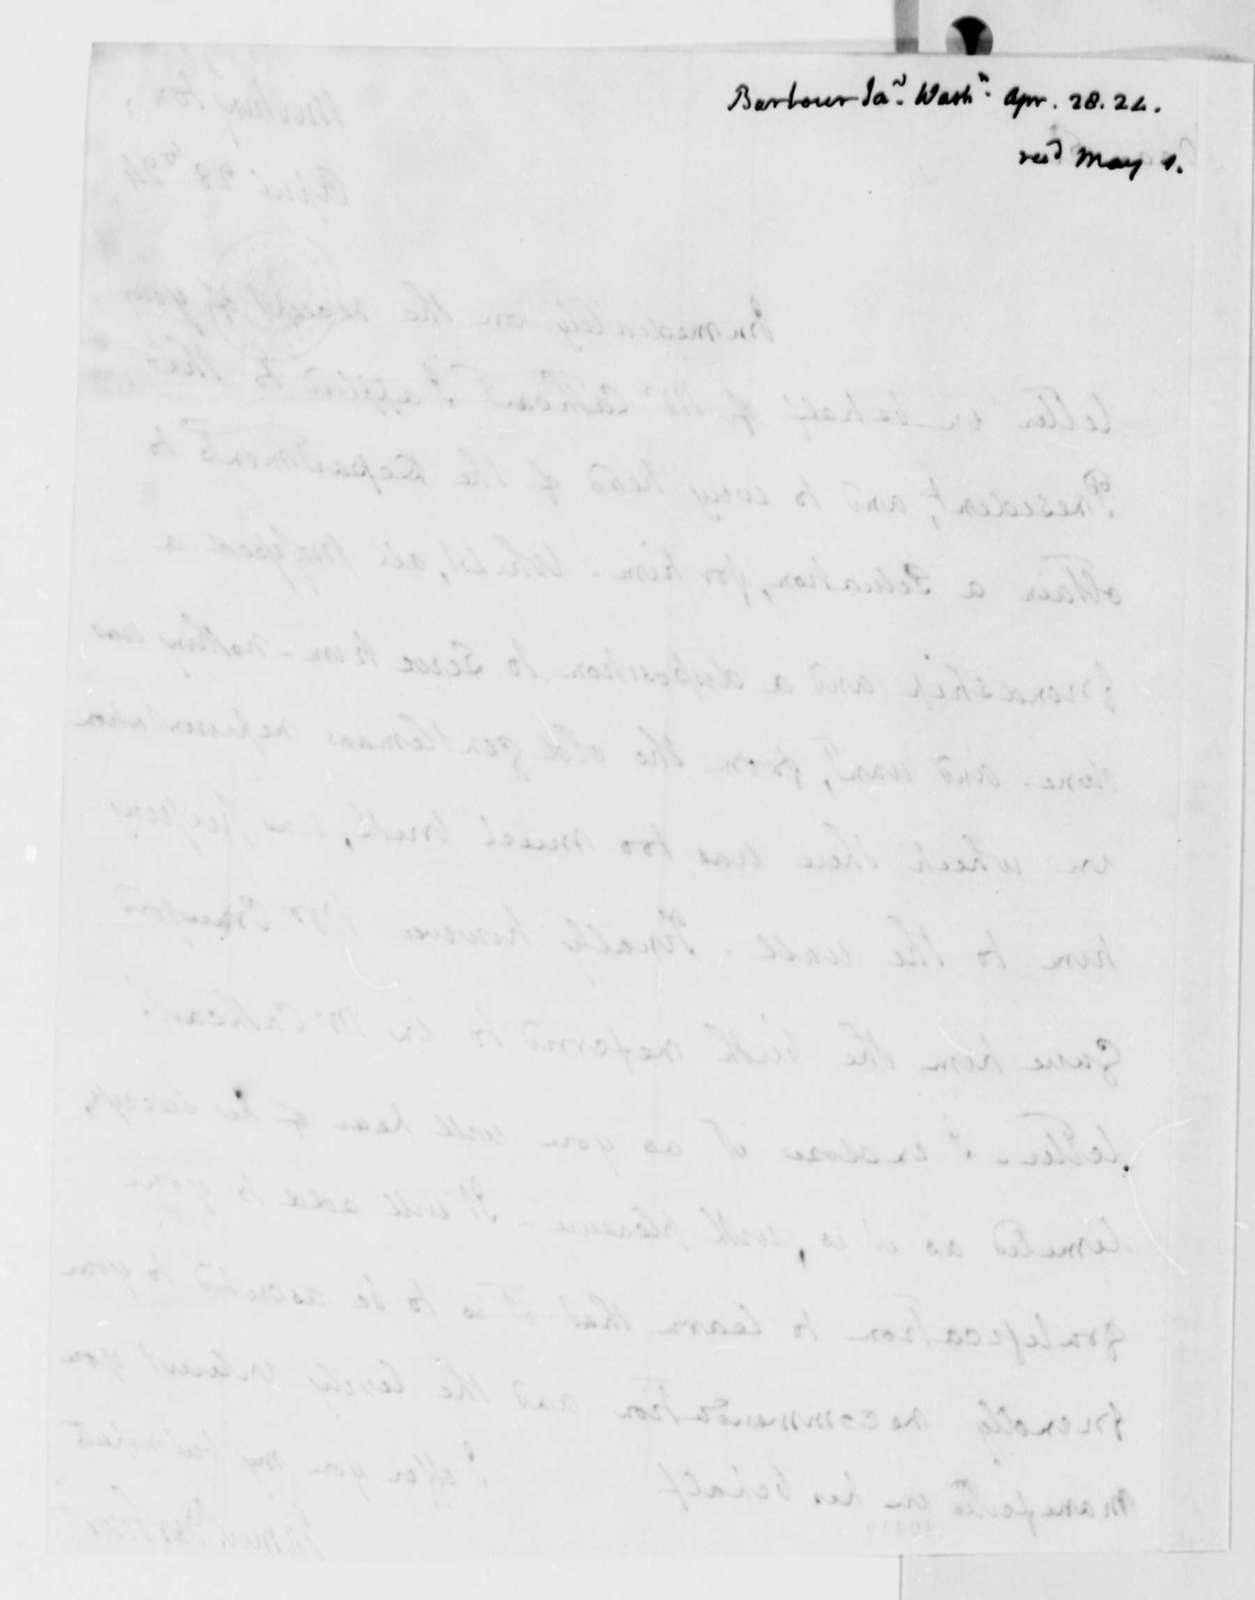 James Barbour to Thomas Jefferson, April 28, 1824